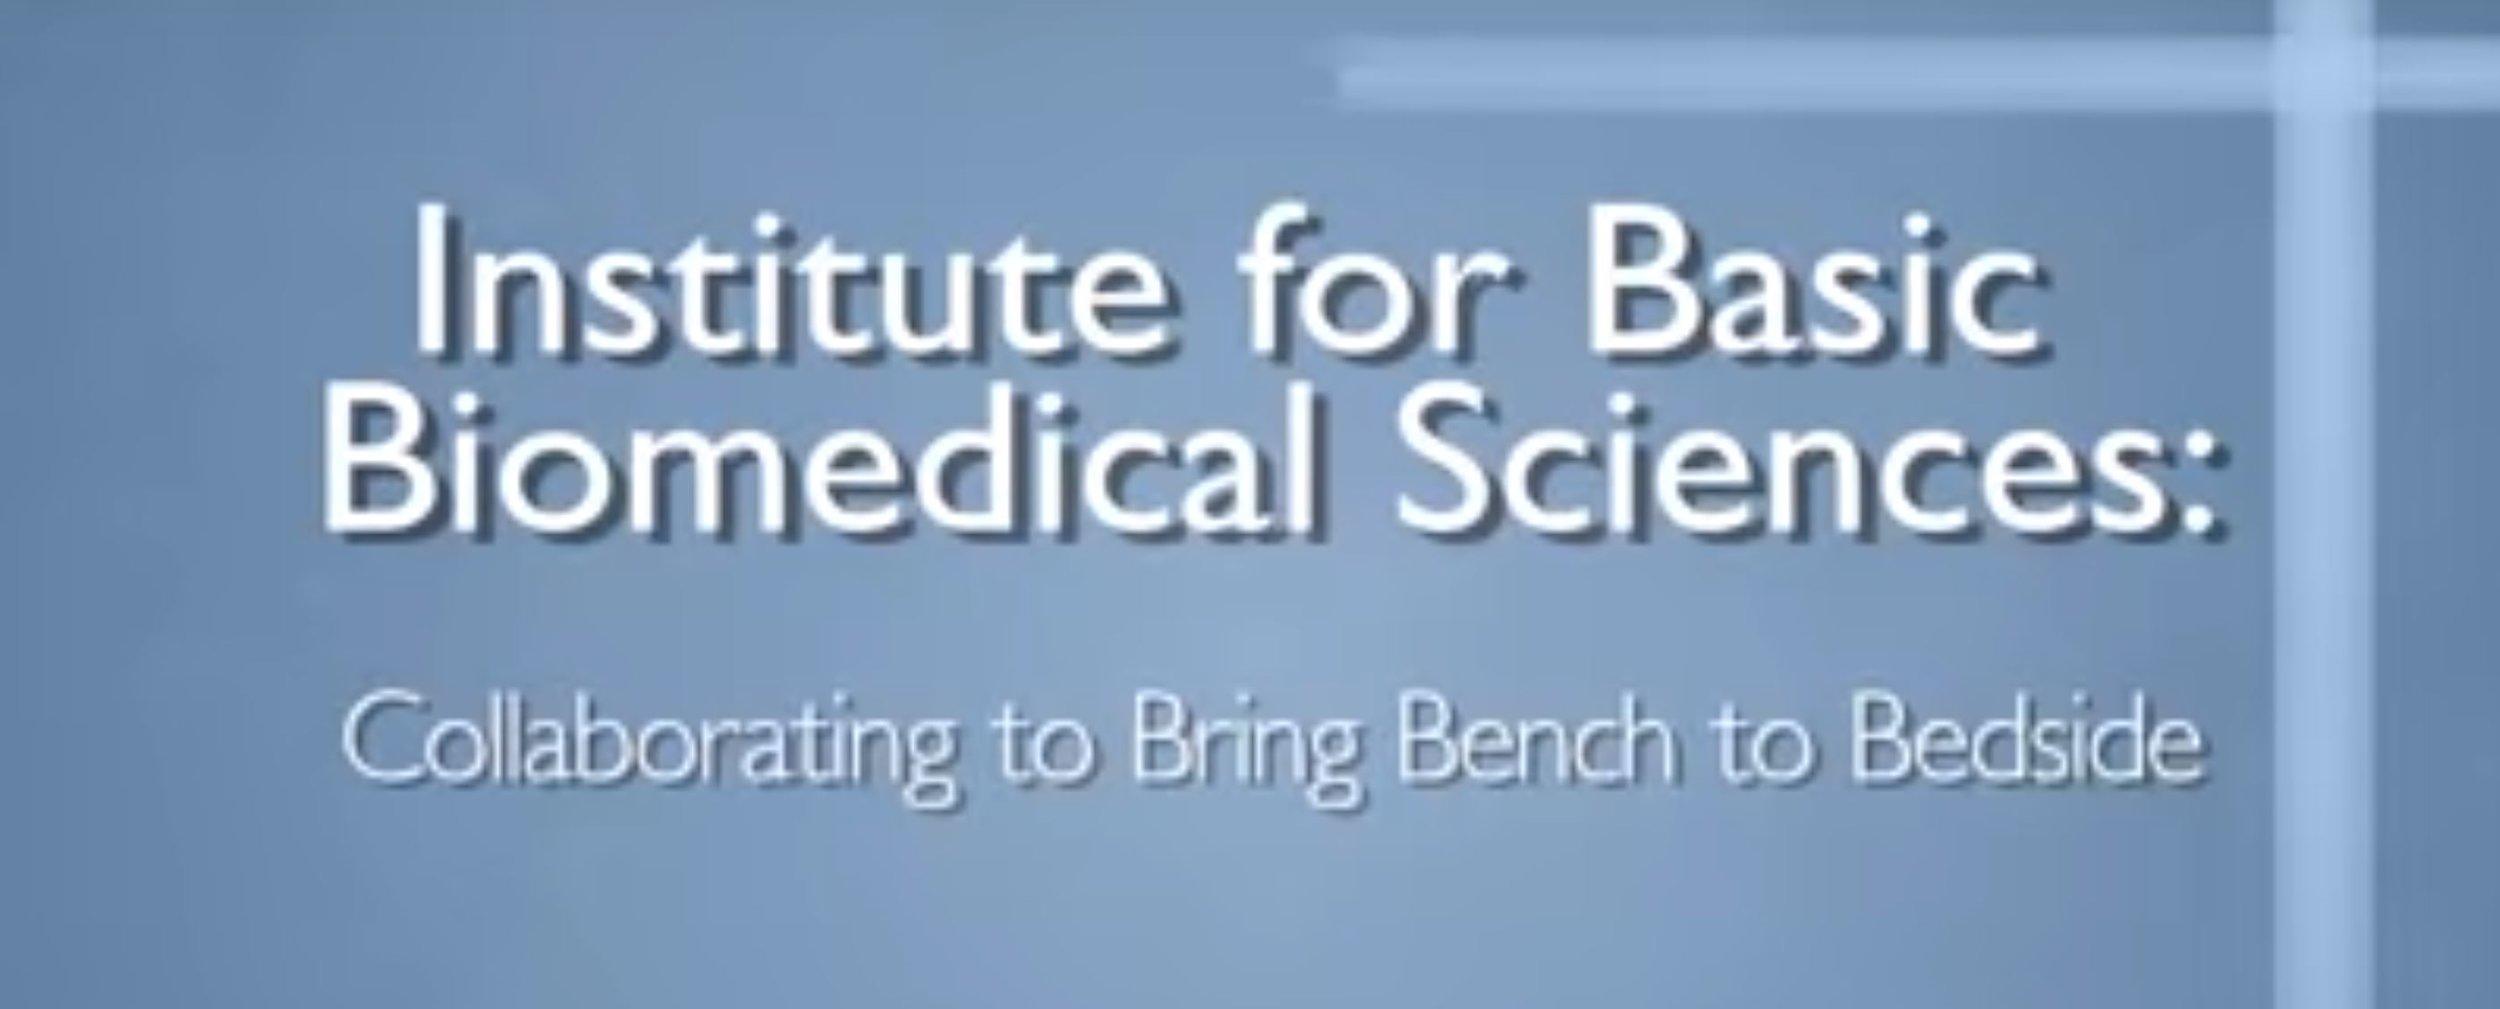 Institute for Basic Biomedical Sciences